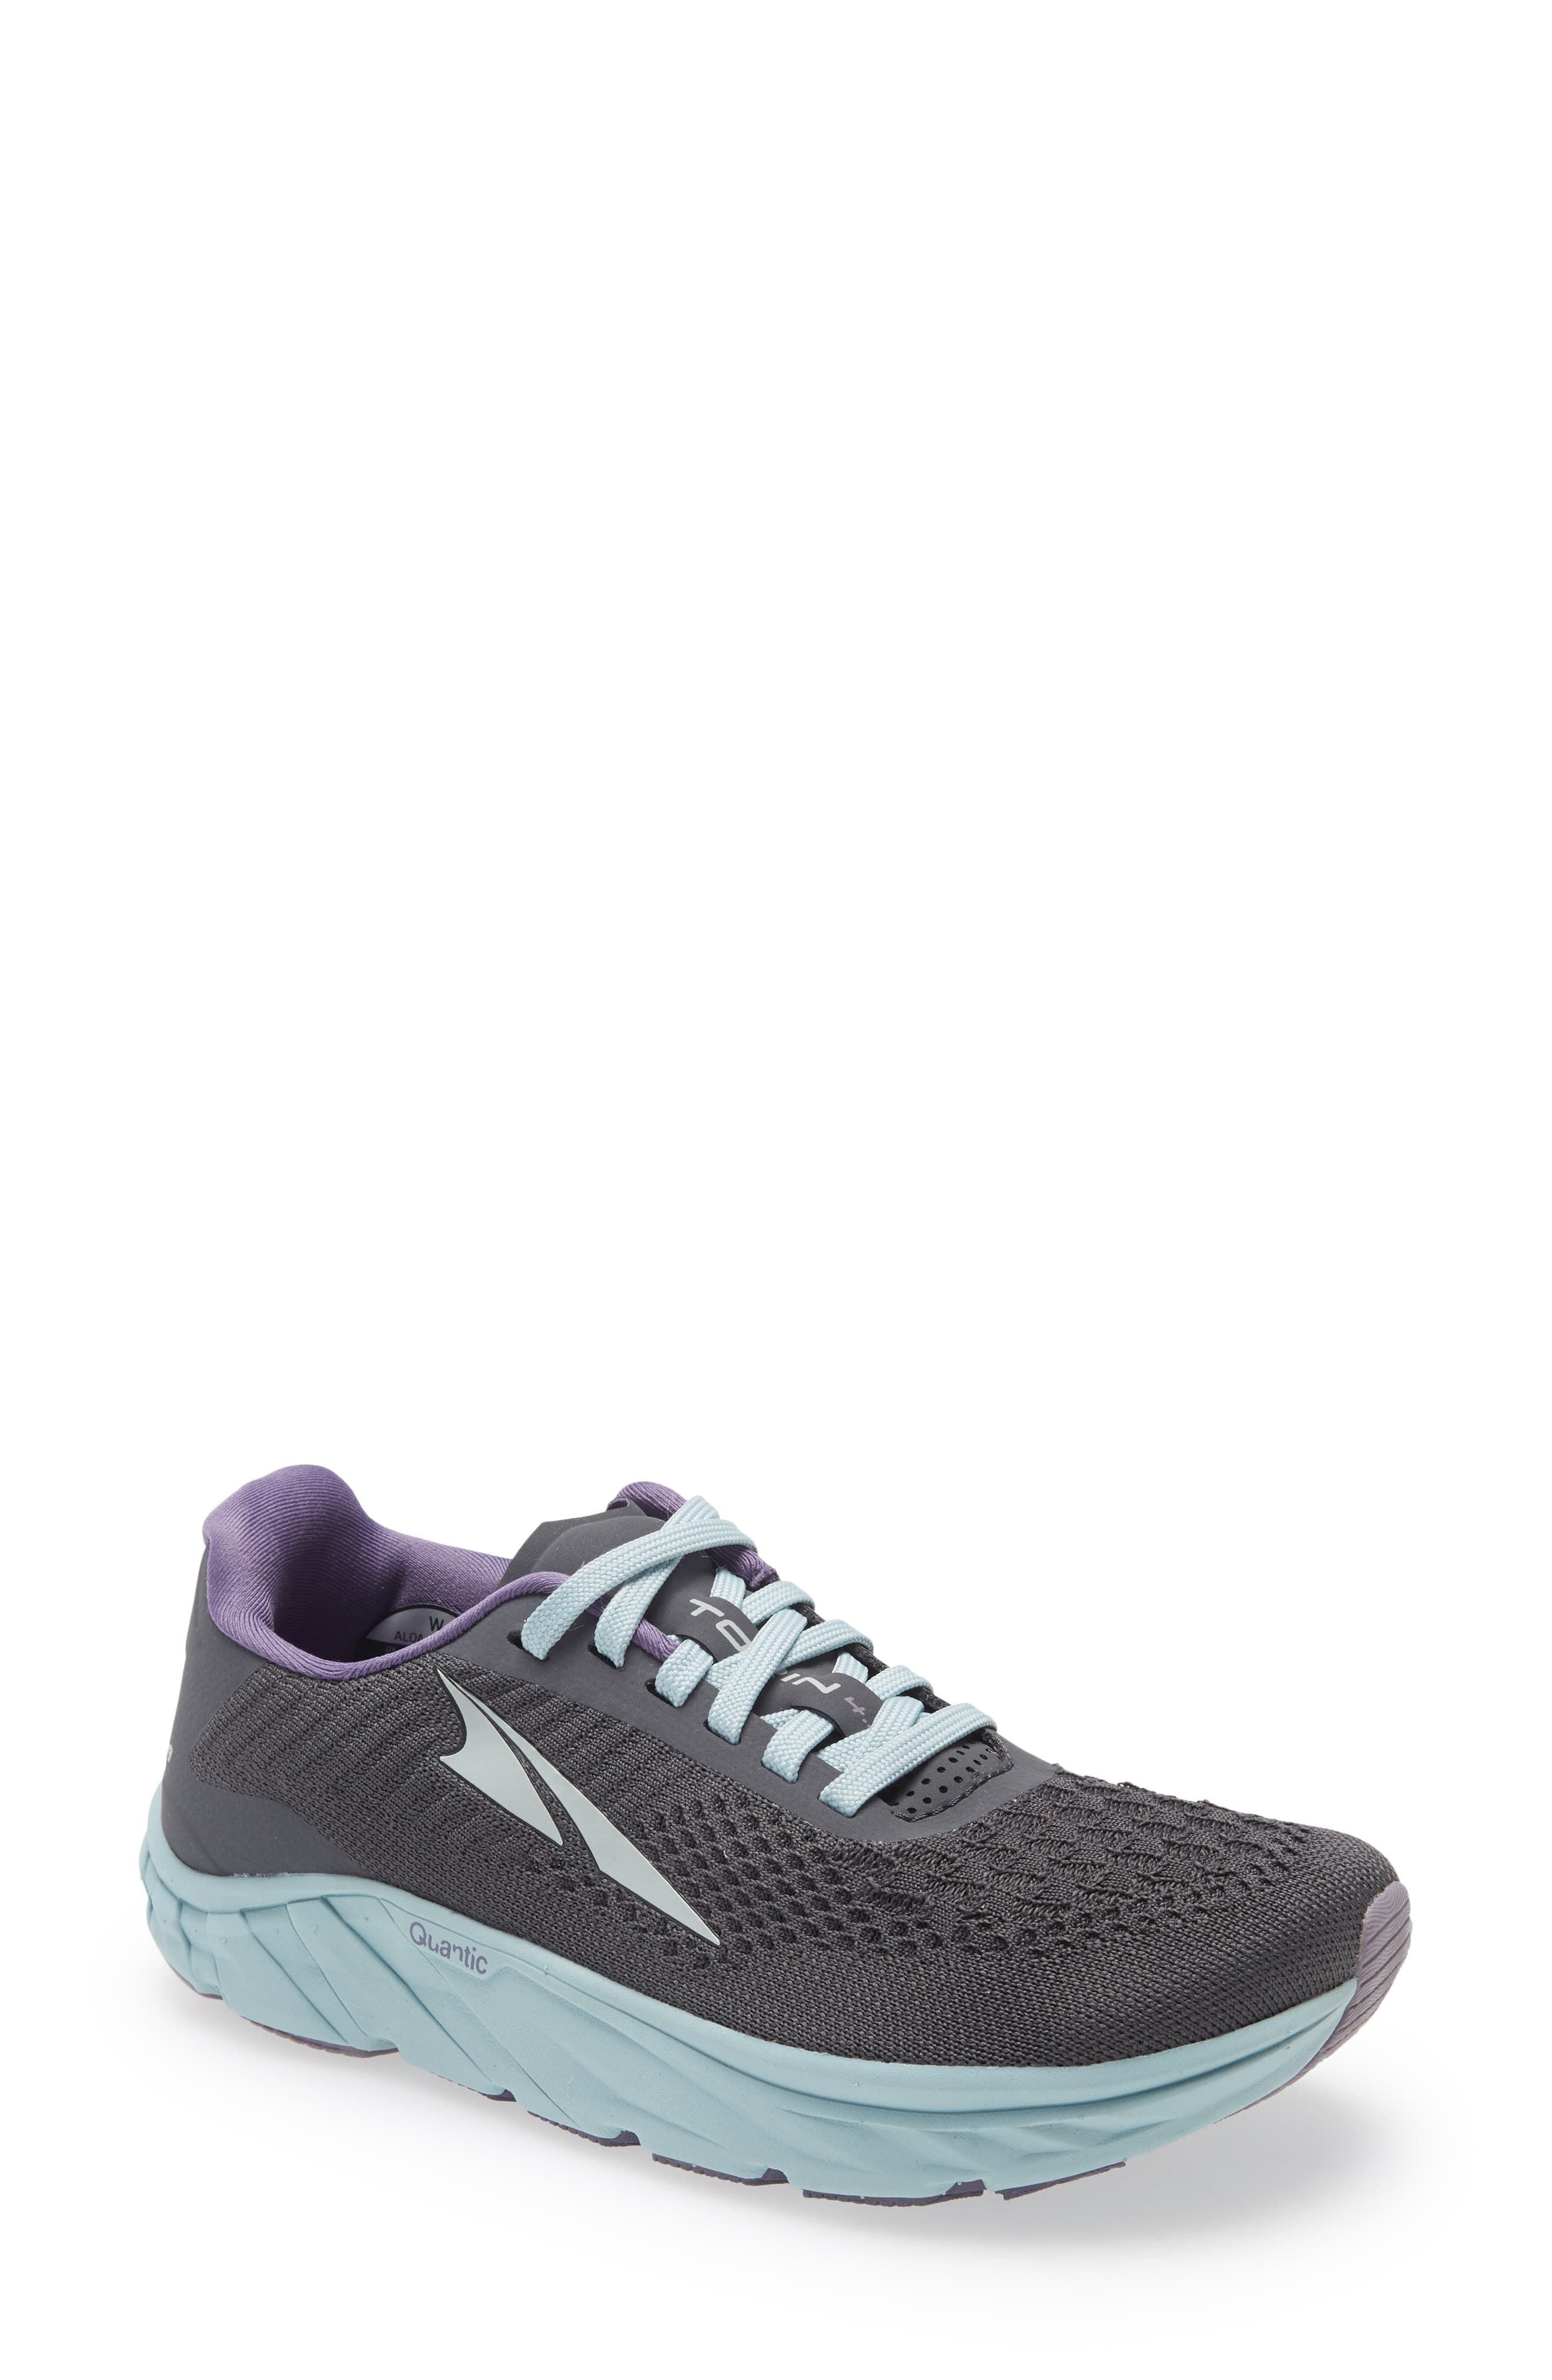 Torin 4.5 Plush Running Shoe